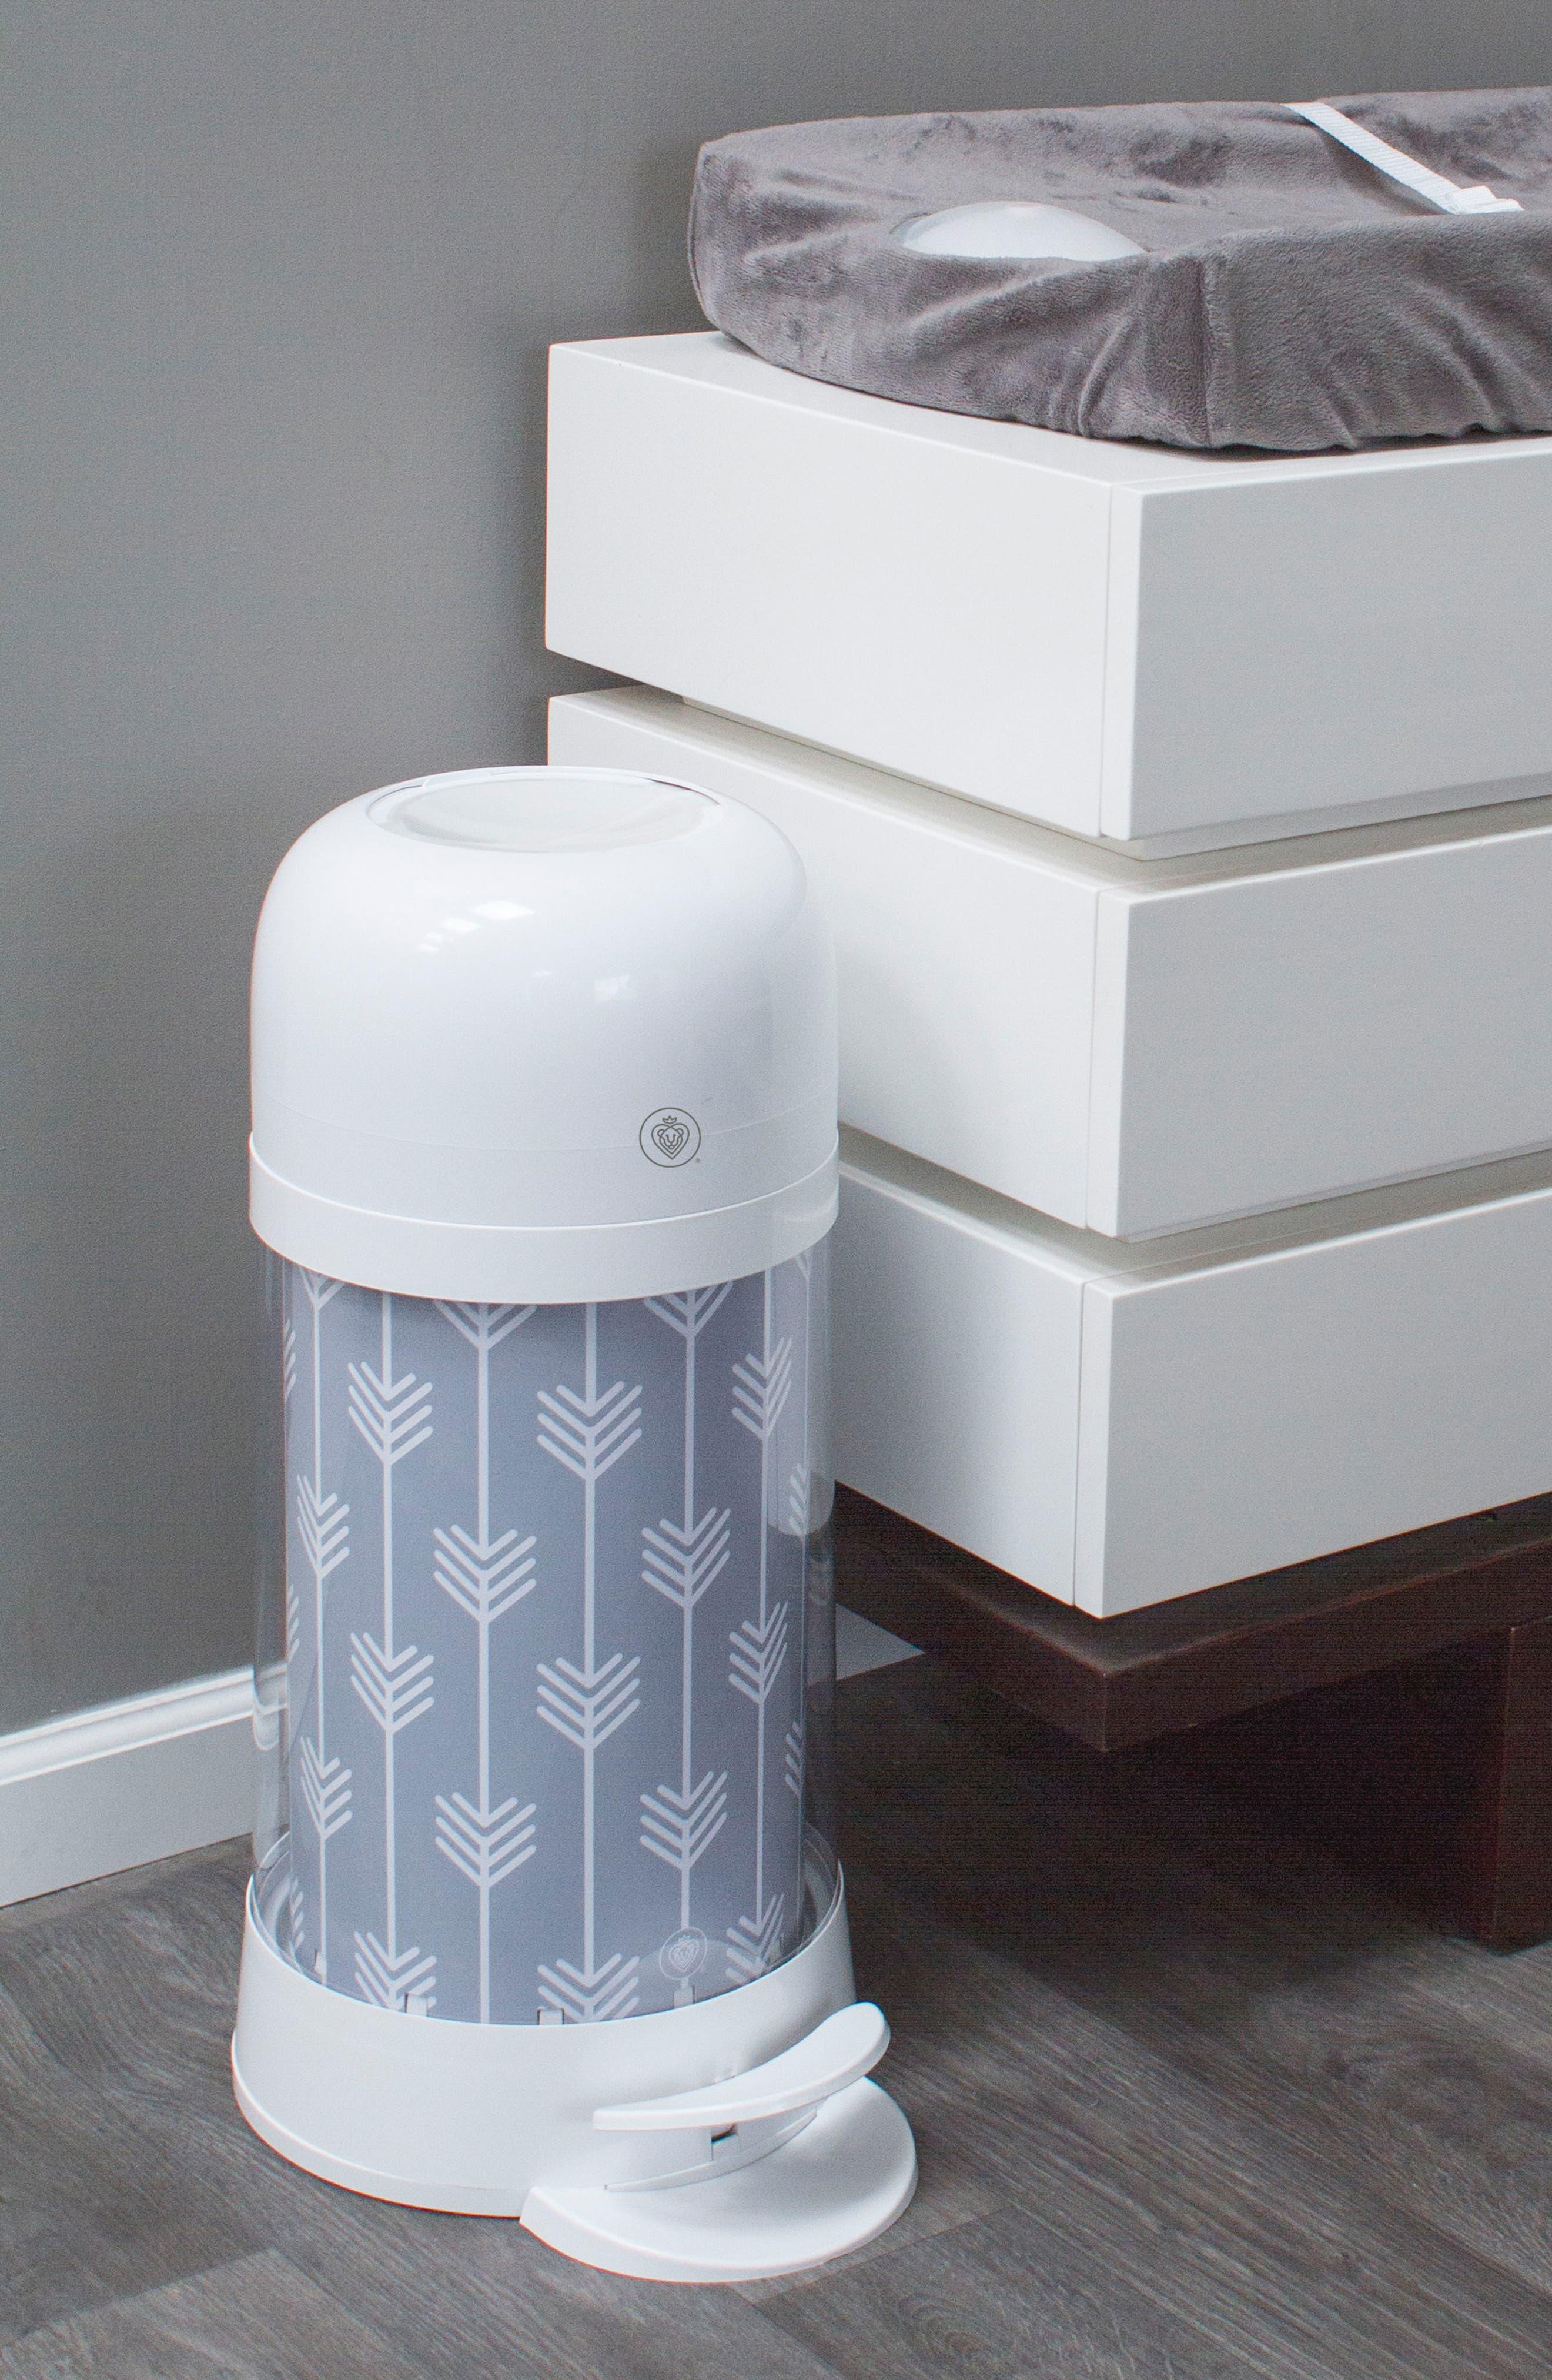 PRINCE LIONHEART,                             Twist'r Diaper Disposal System,                             Alternate thumbnail 4, color,                             020